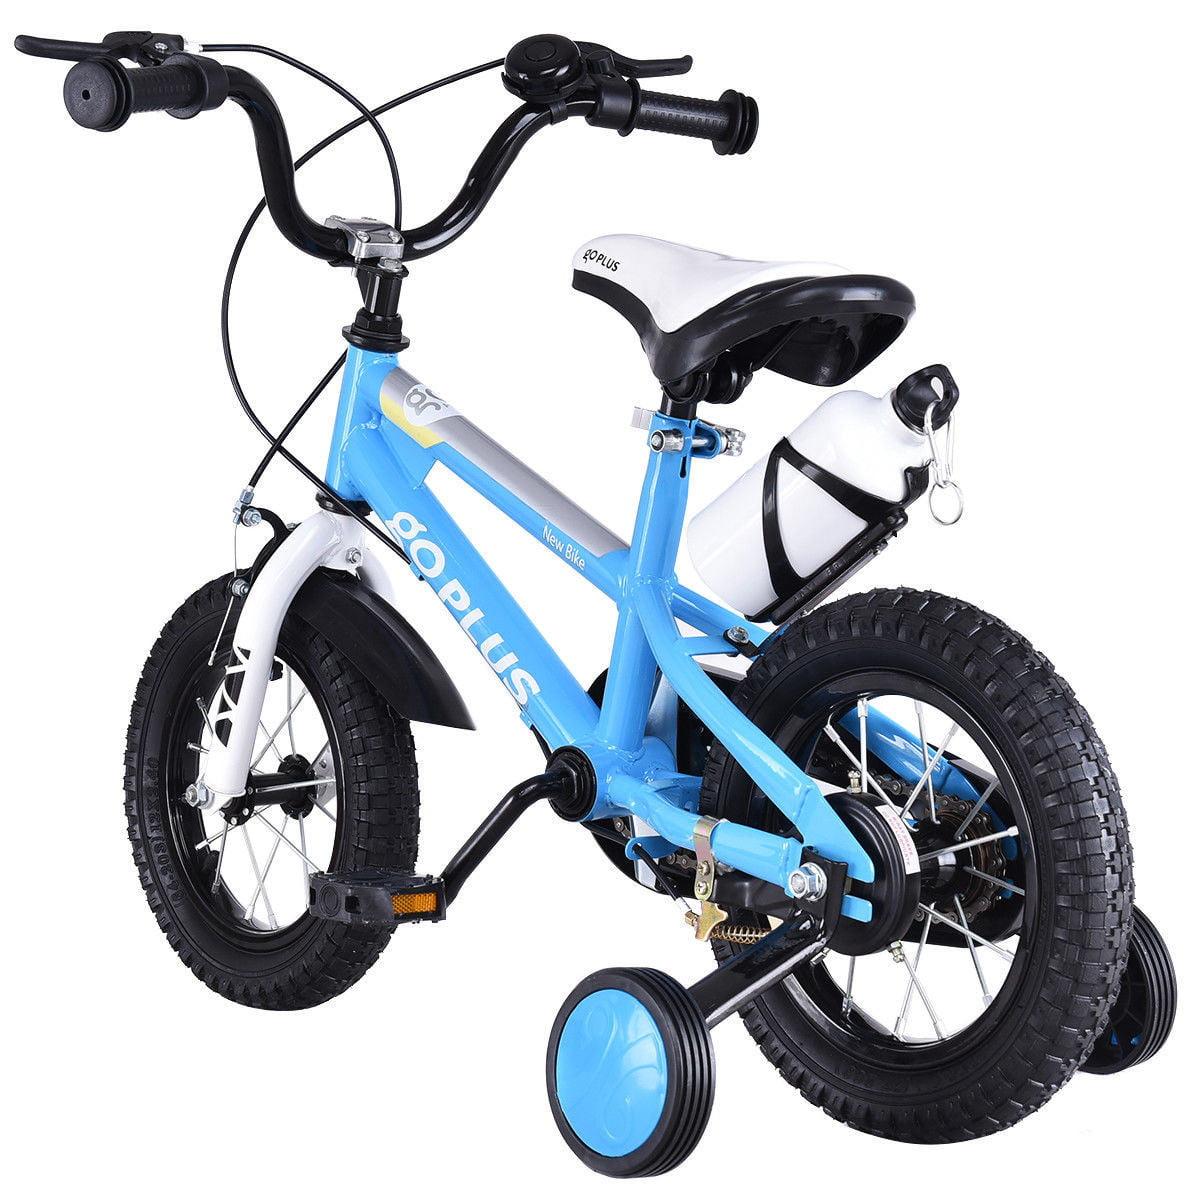 2471010b42f Goplus 16   Freestyle Kids Bike Bicycle Children Boys   Girls w Training  Wheels Blue - Walmart.com